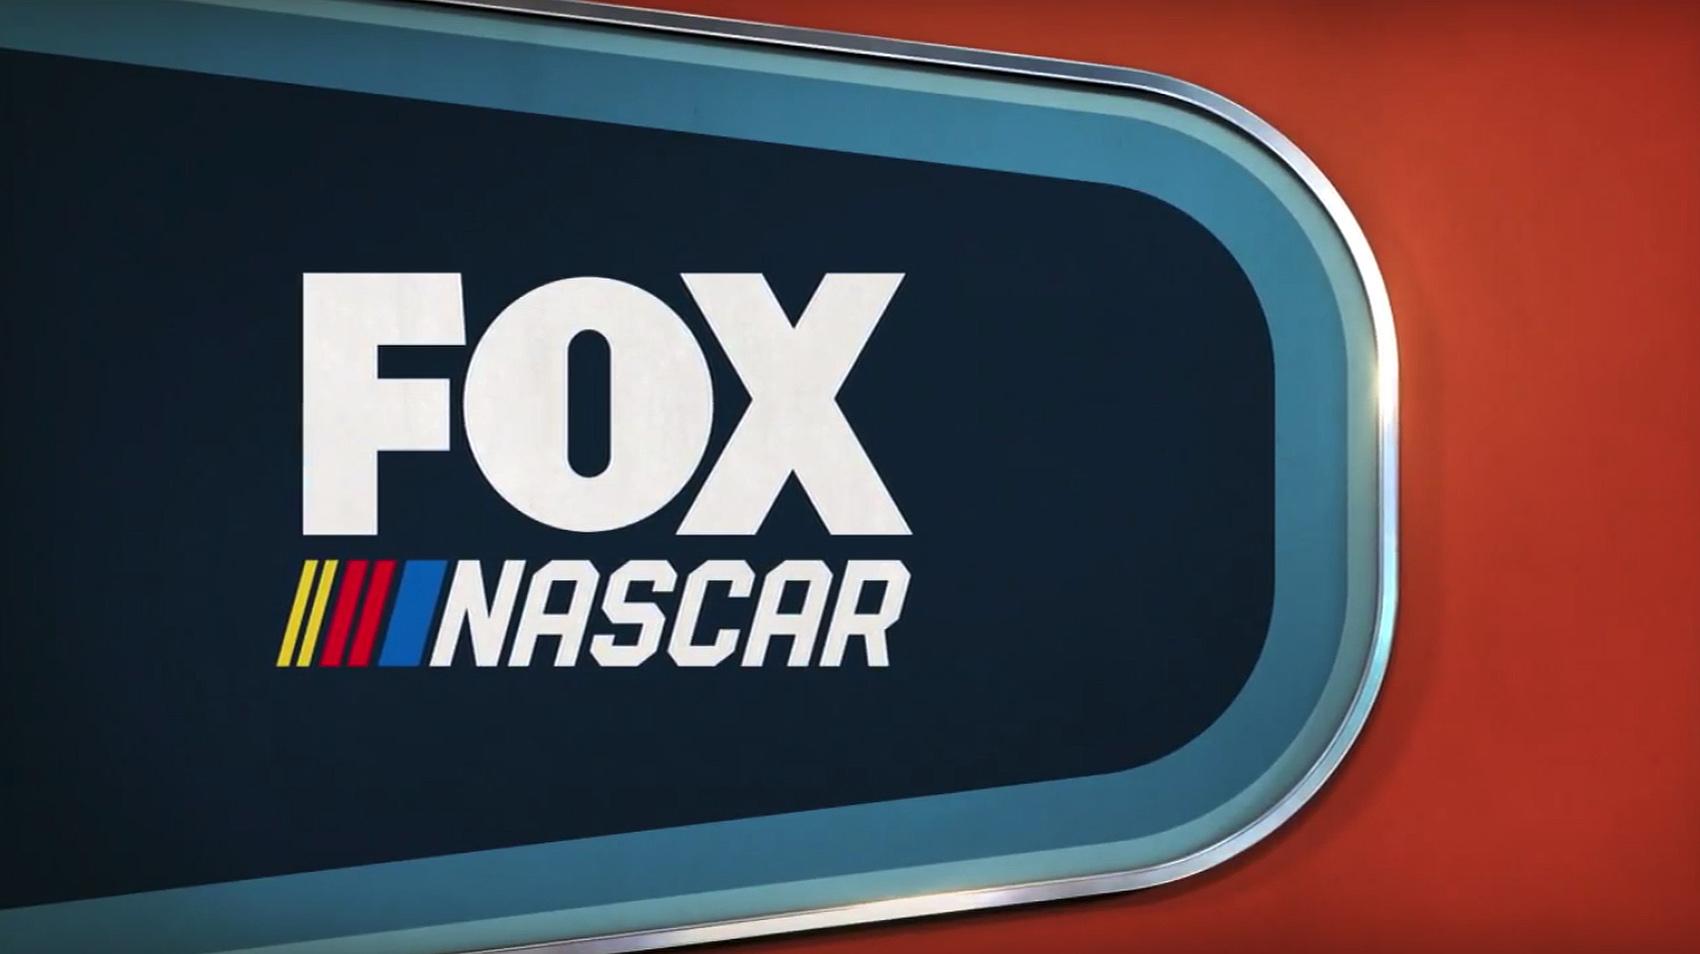 NCS_NASCAR-Fox-2019-Broadcast-Design_001